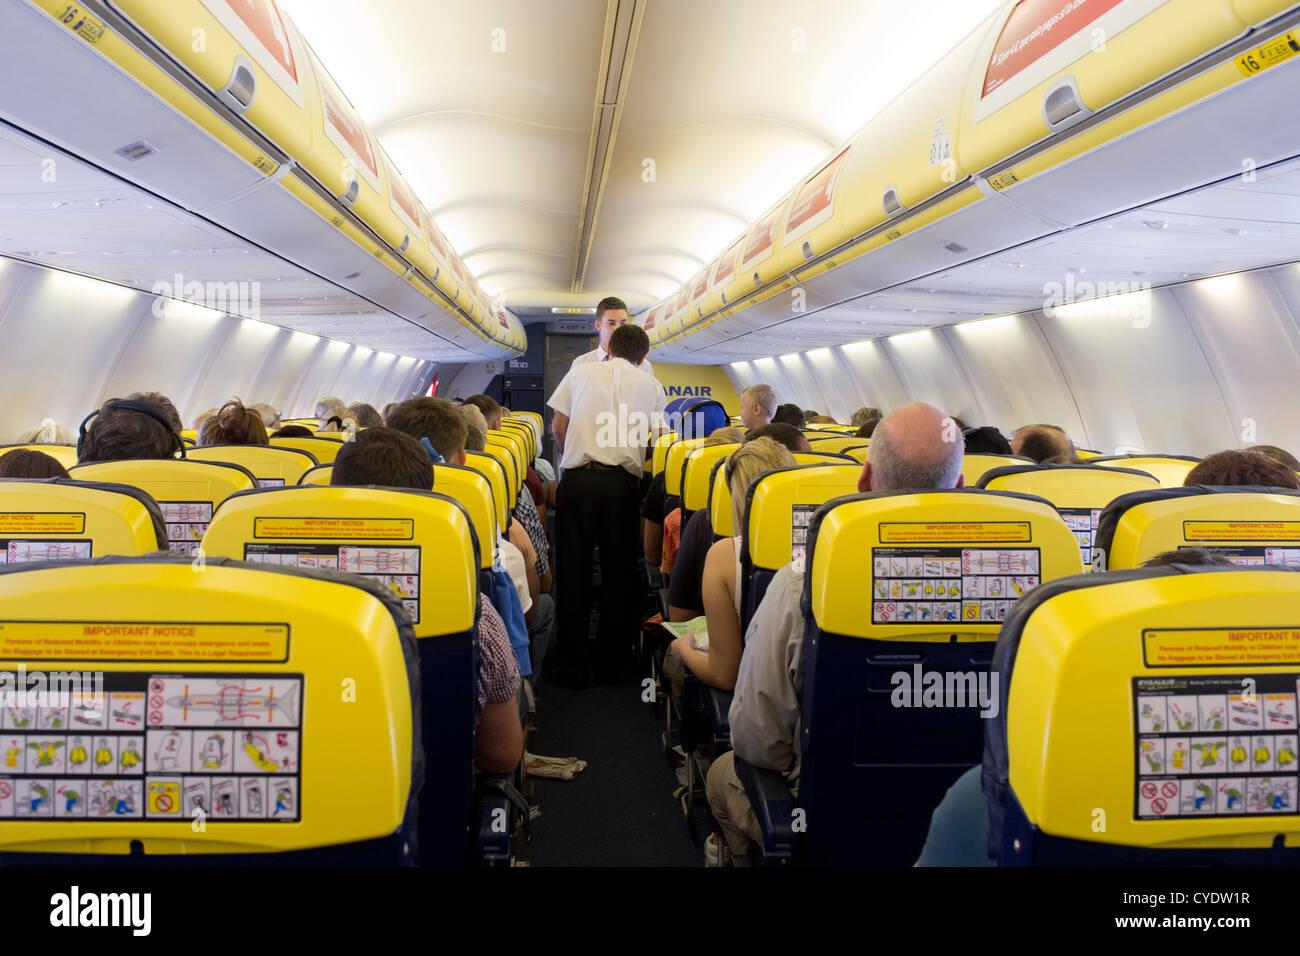 Ryanair plane cabin interior - Stock Image